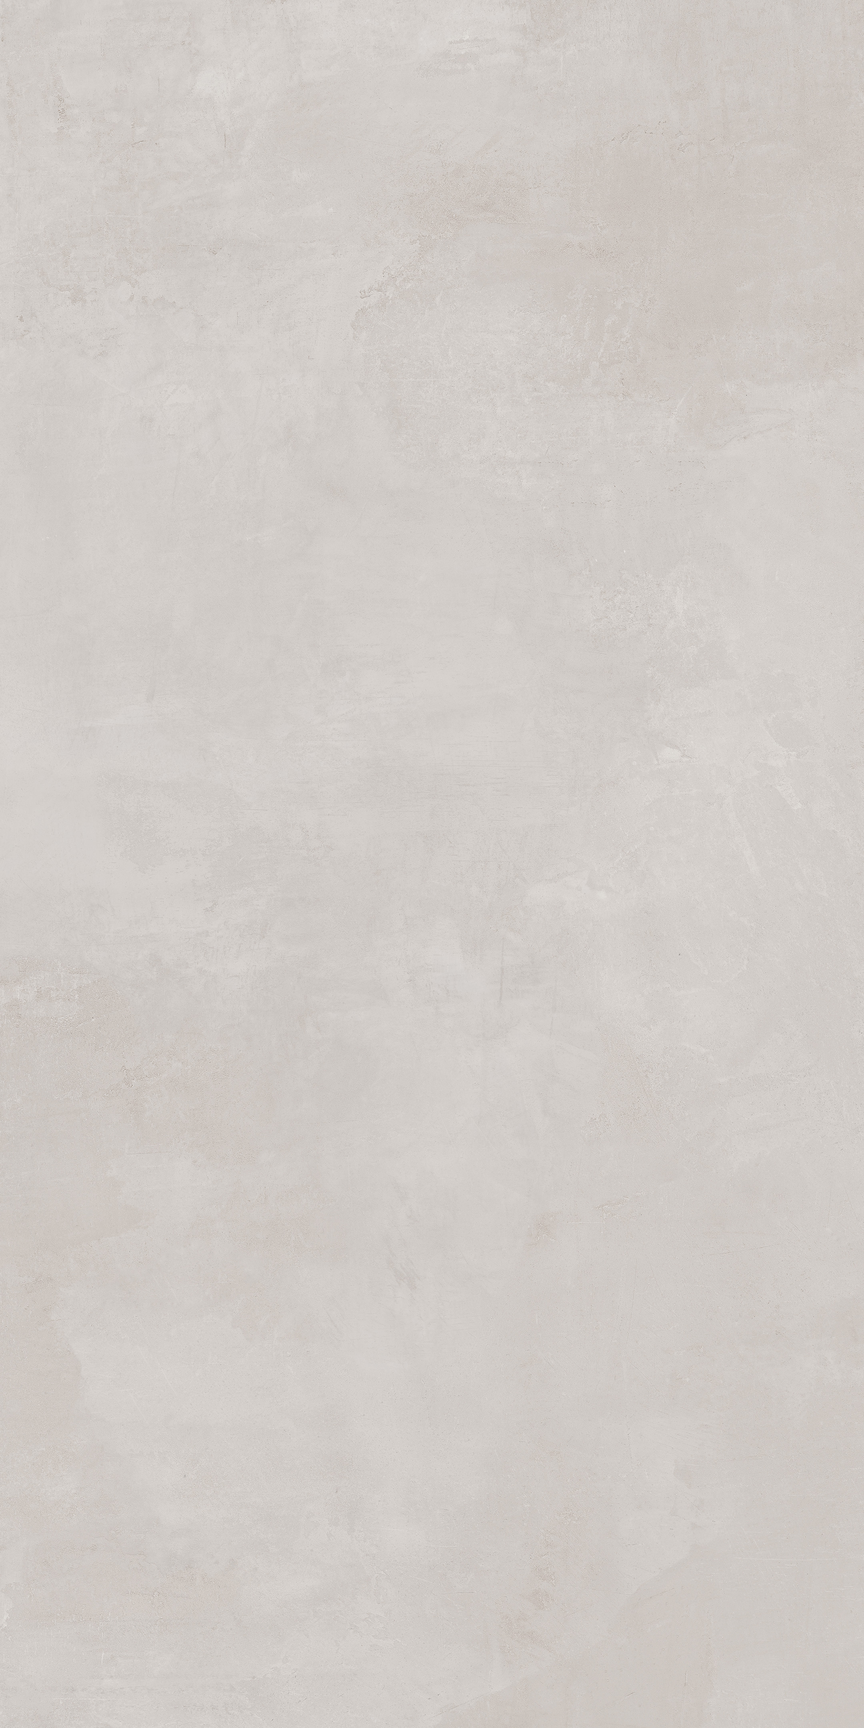 E. Houston Warm Gray Floor/Wall Tile 24x48